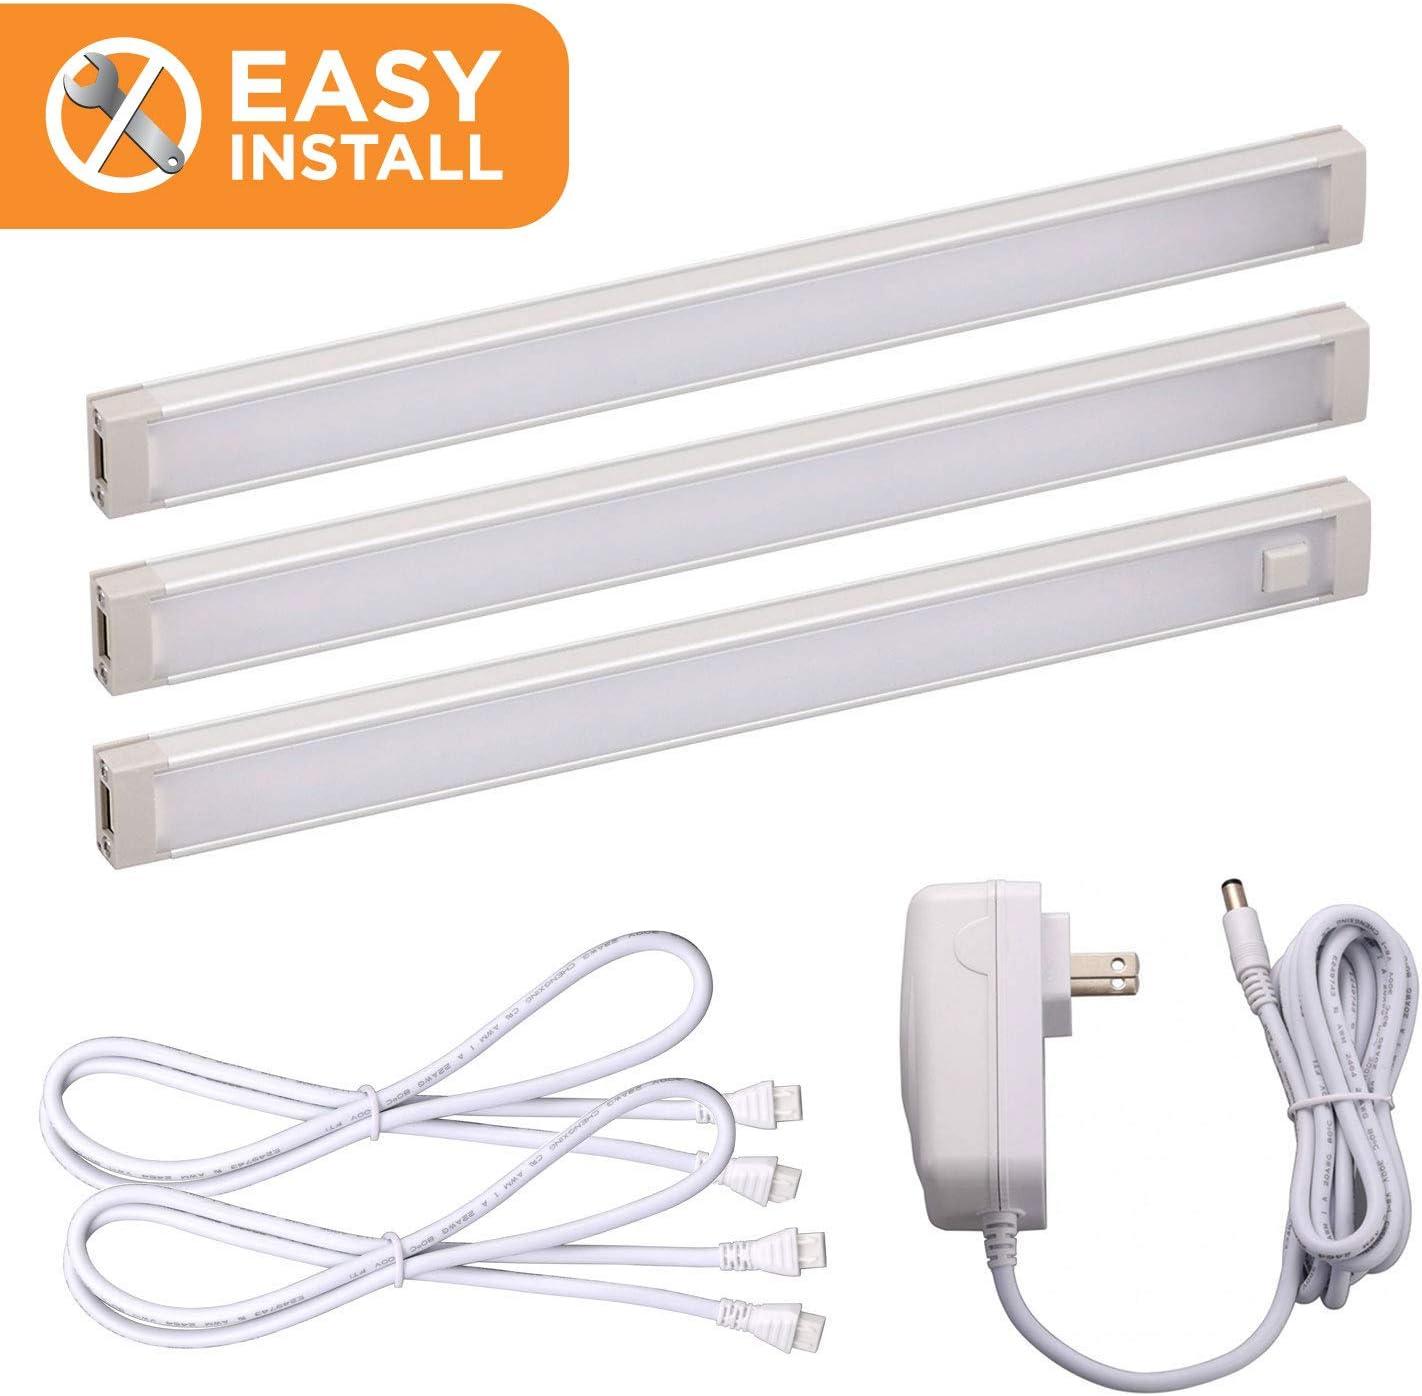 Black Decker LED Under Cabinet Lighting Kit, 3-Bars, 9 Inches Each, DIY Tool-Free Installation, Warm White, 2700K, 1080 Lumens, 15 Watts, Home Accent Lighting LEDUC9-3WK